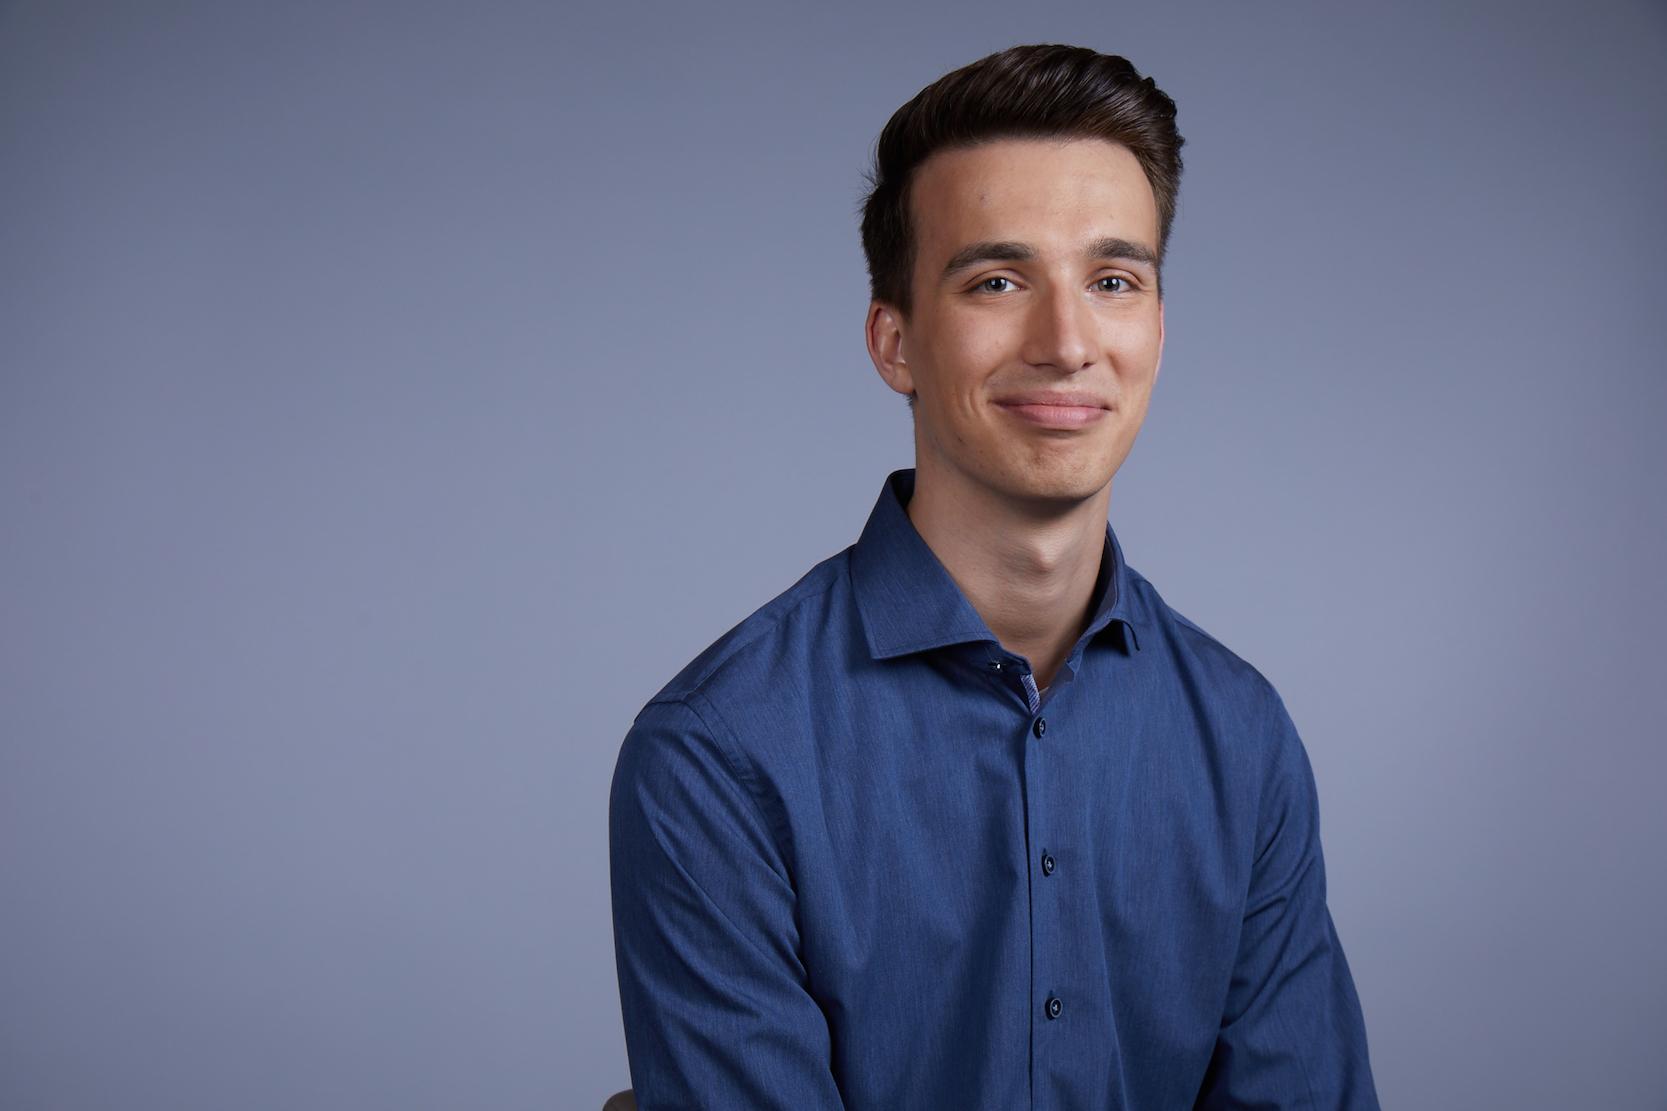 Graduate Success Story - Luke Olney